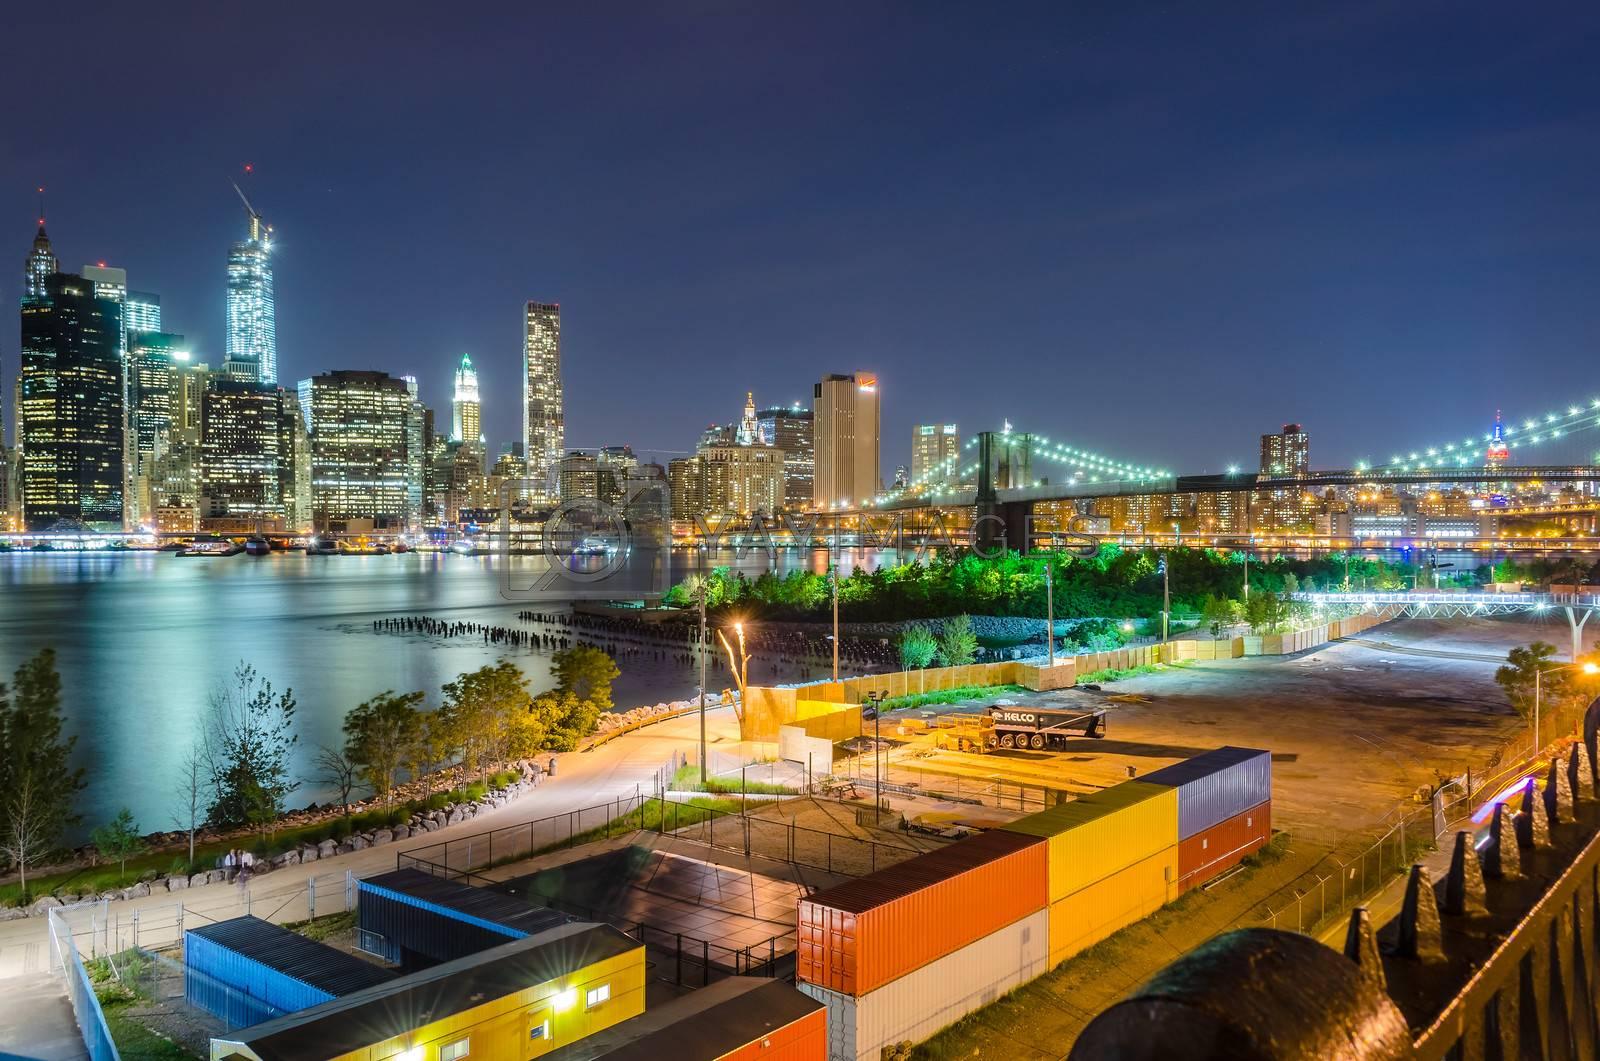 Manhattan Skyline and Brooklyn Bridge at Night, as seen from Brooklyn Heights Promenade